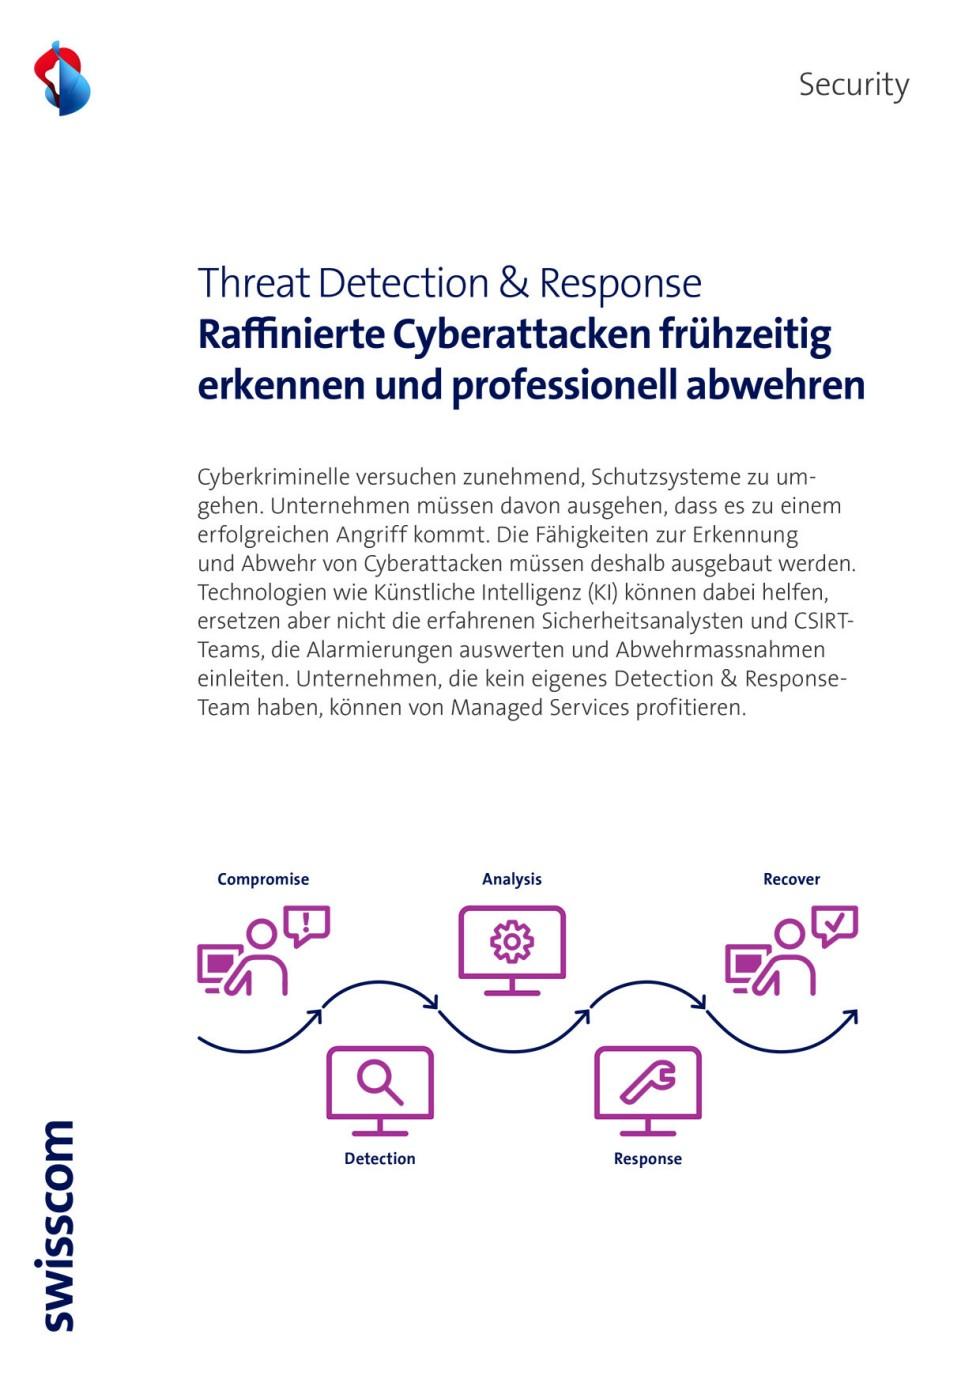 Titelbild des Infopaketes: Threat Detection and Response